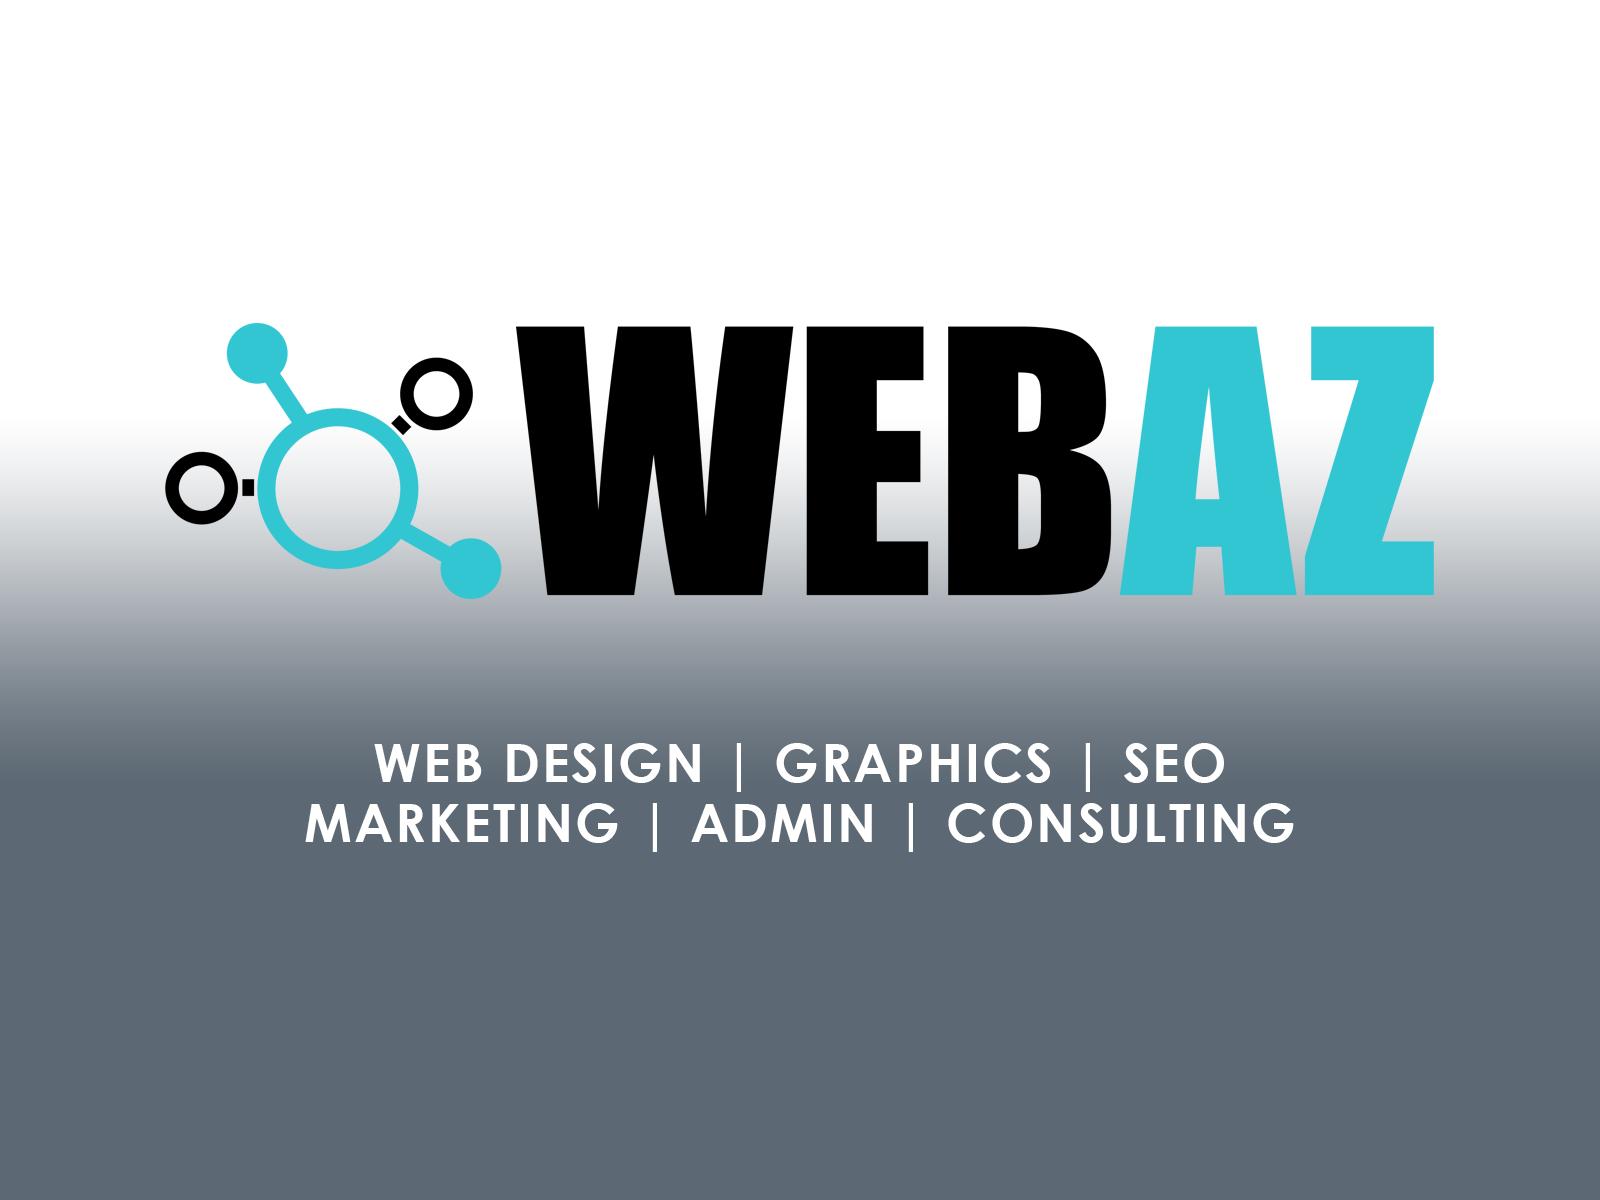 WebAZ web design web development seo marketing consulting admin services